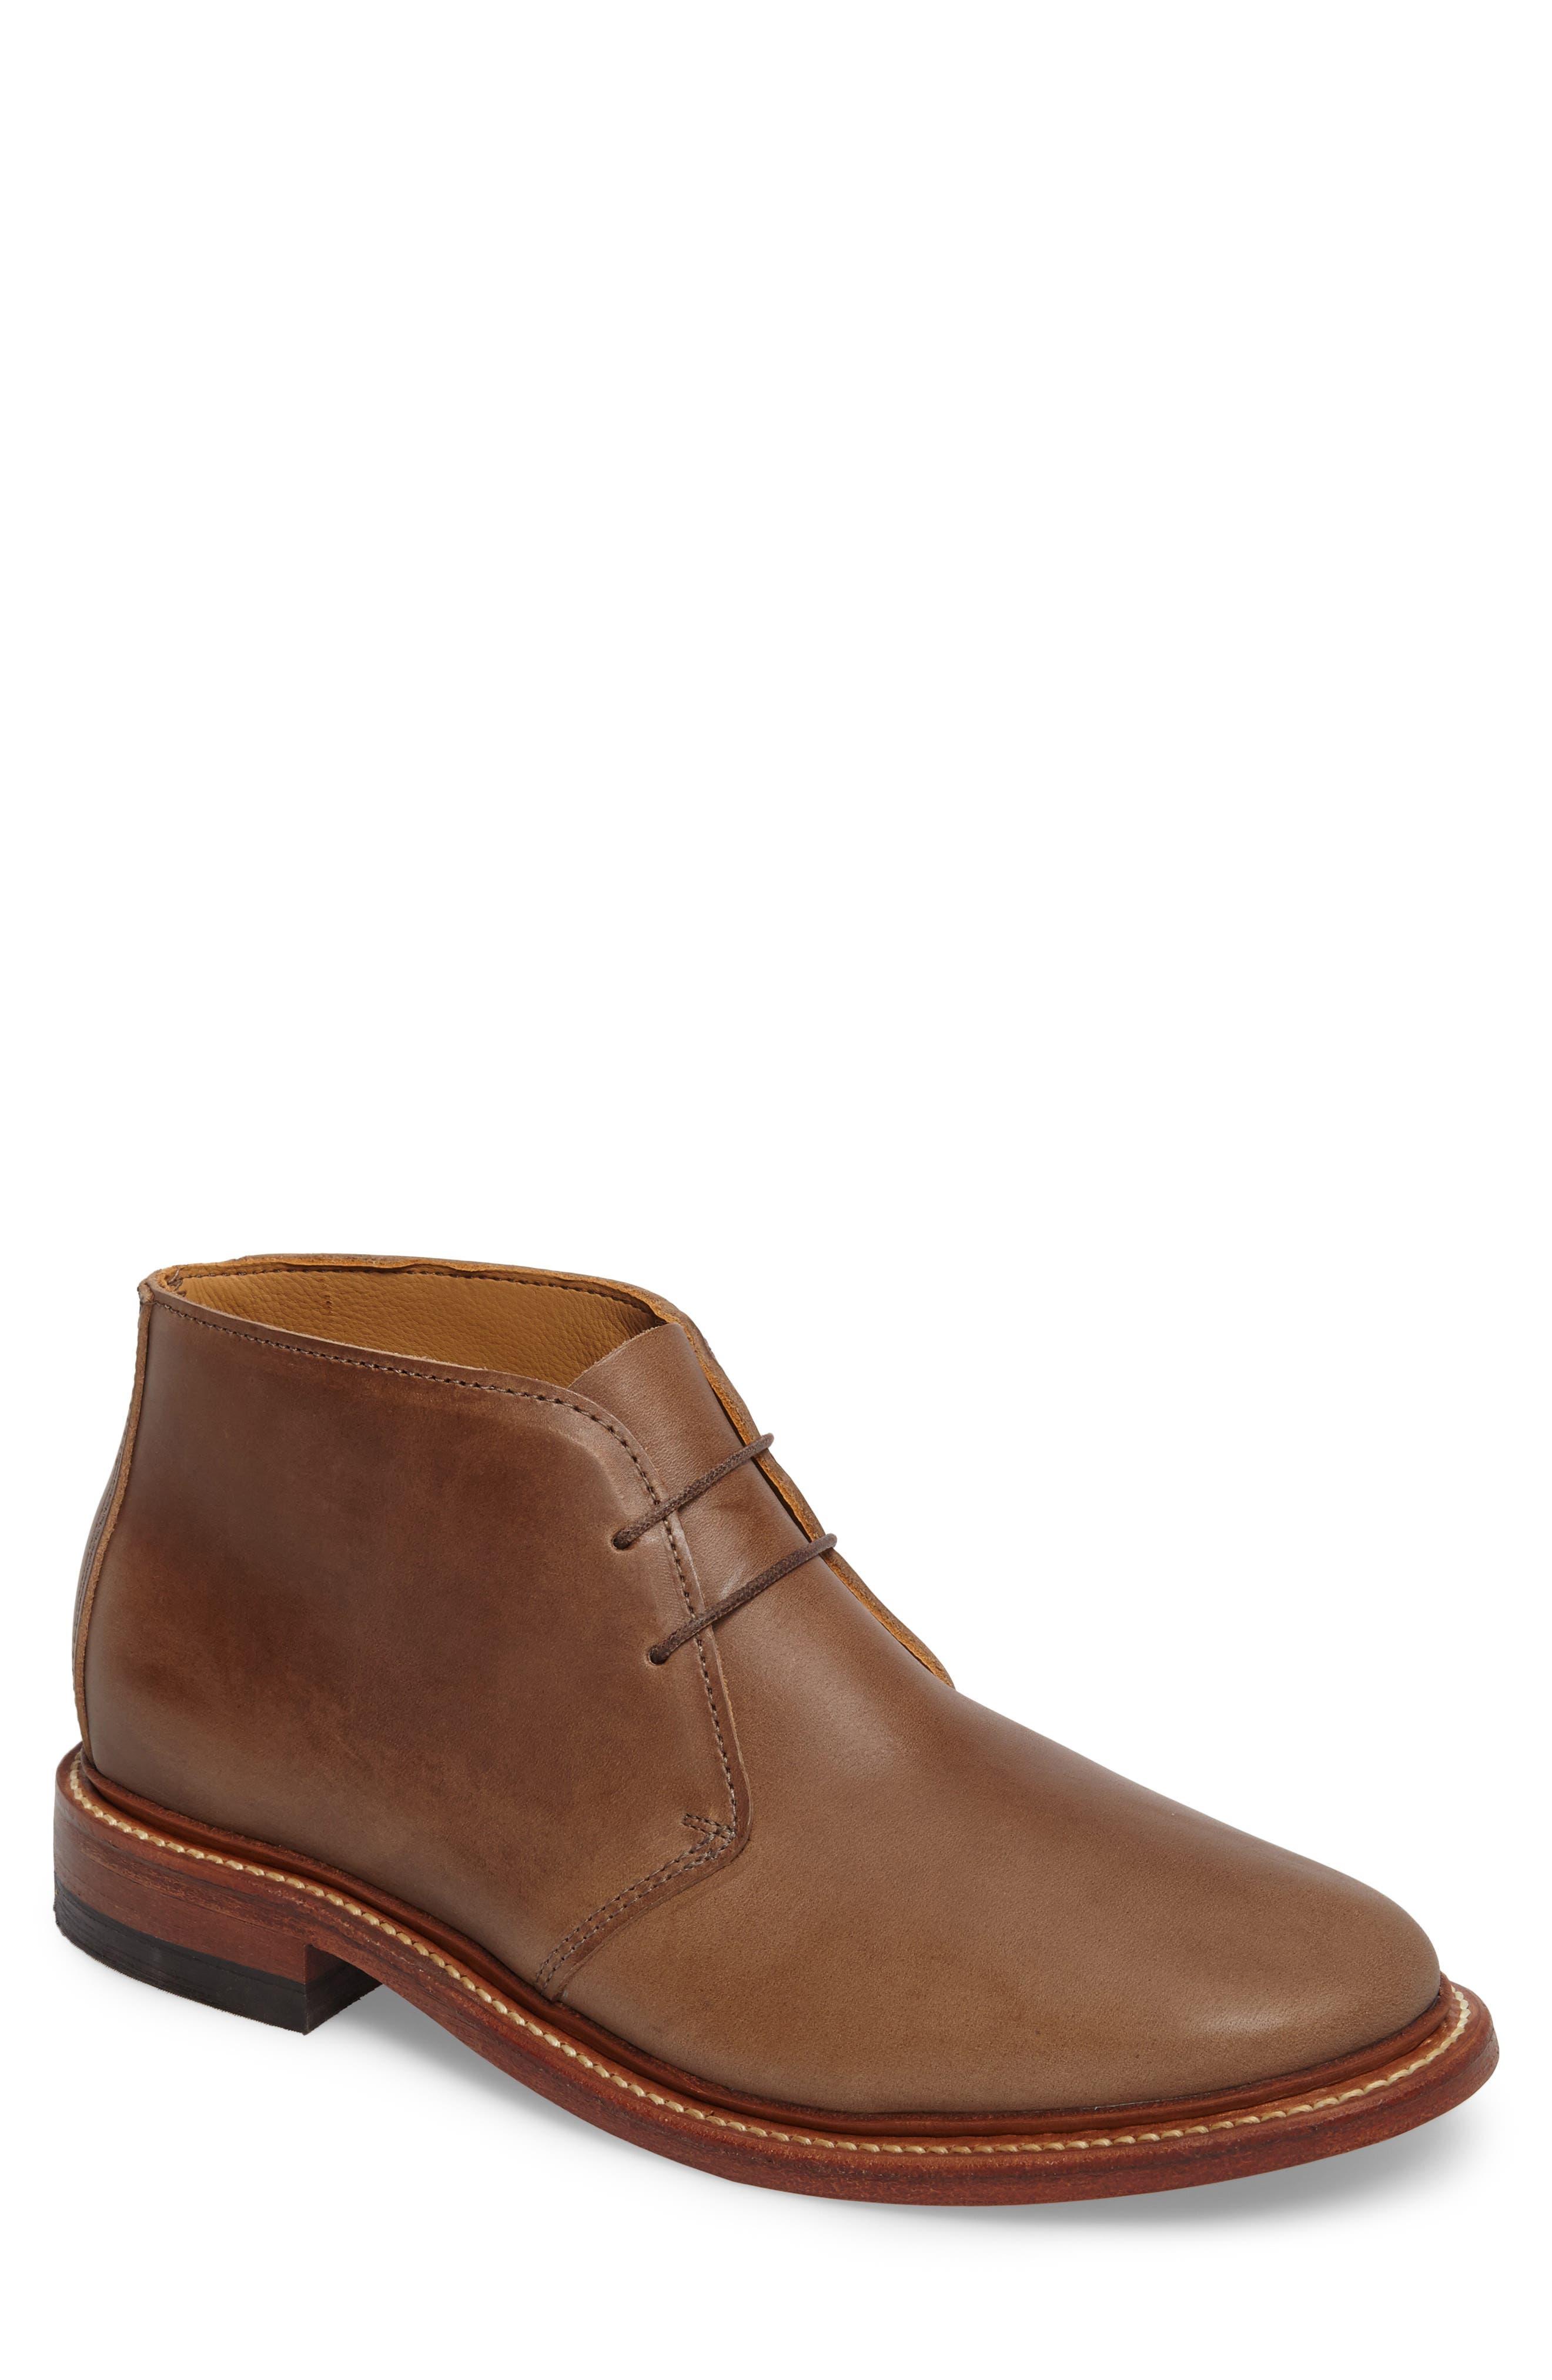 Alternate Image 1 Selected - Oak Street Bootmakers Campus Chukka Boot (Men)